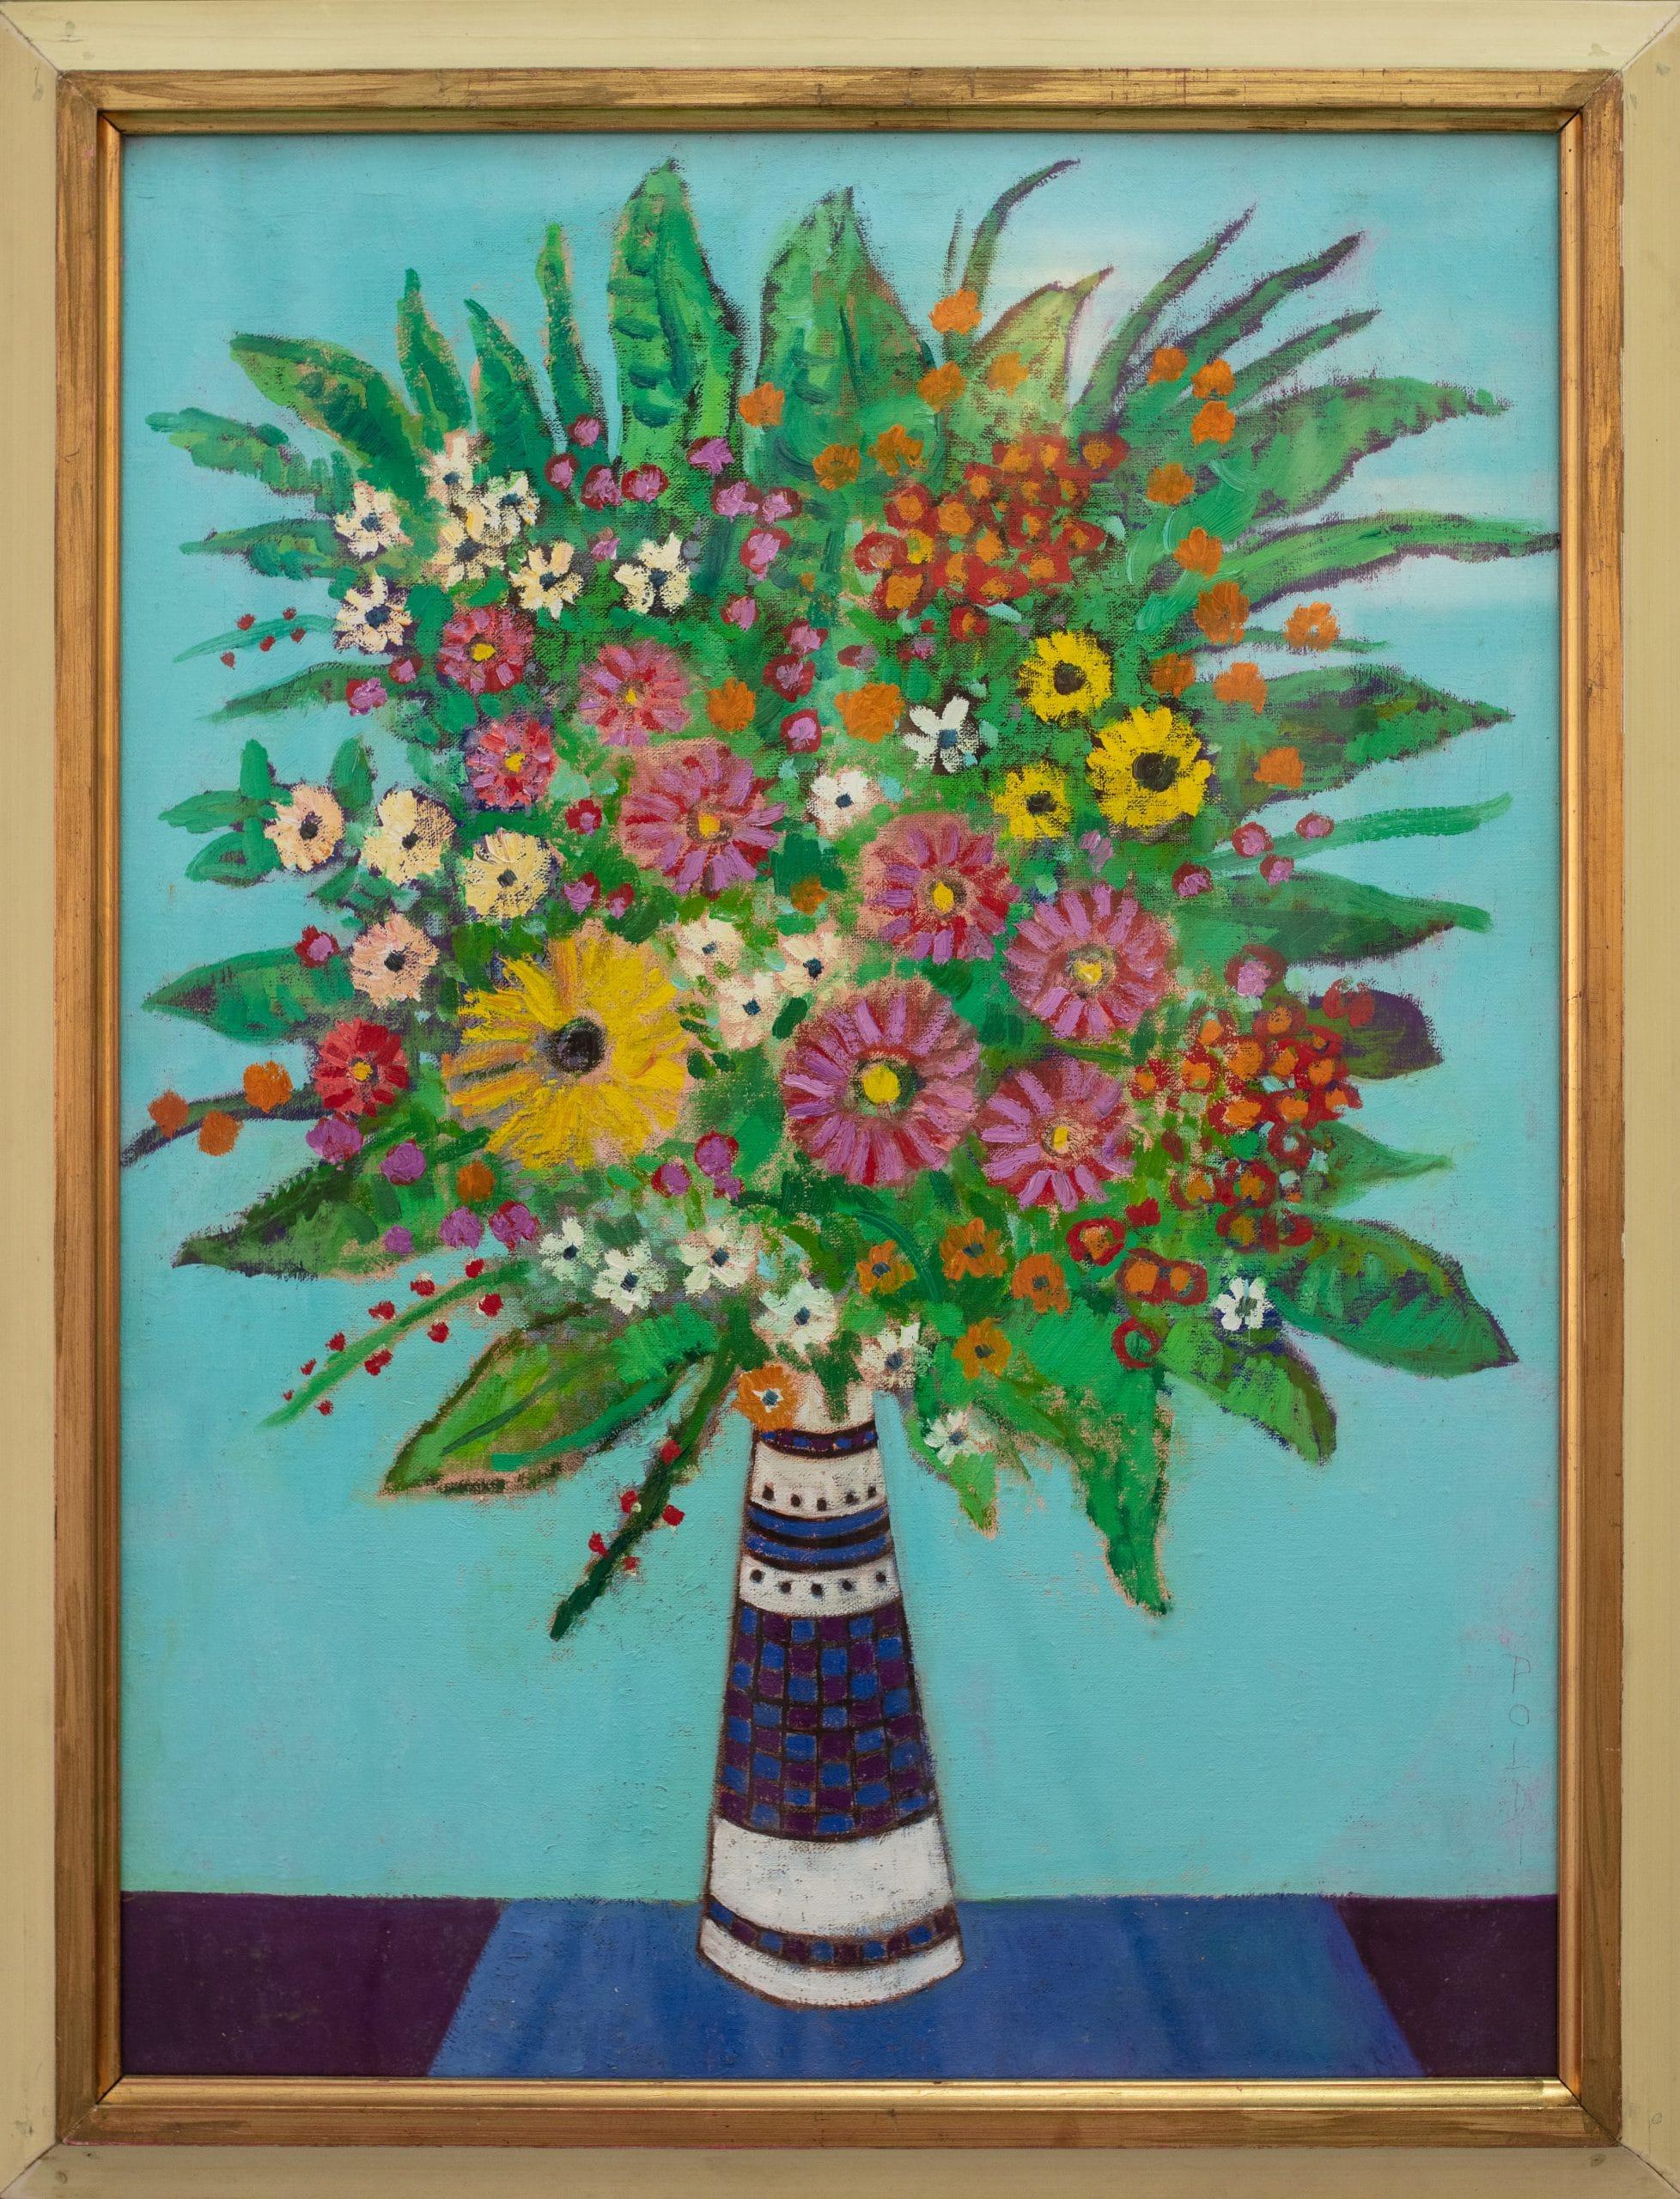 Bőhm Lipót: Virágcsendélet